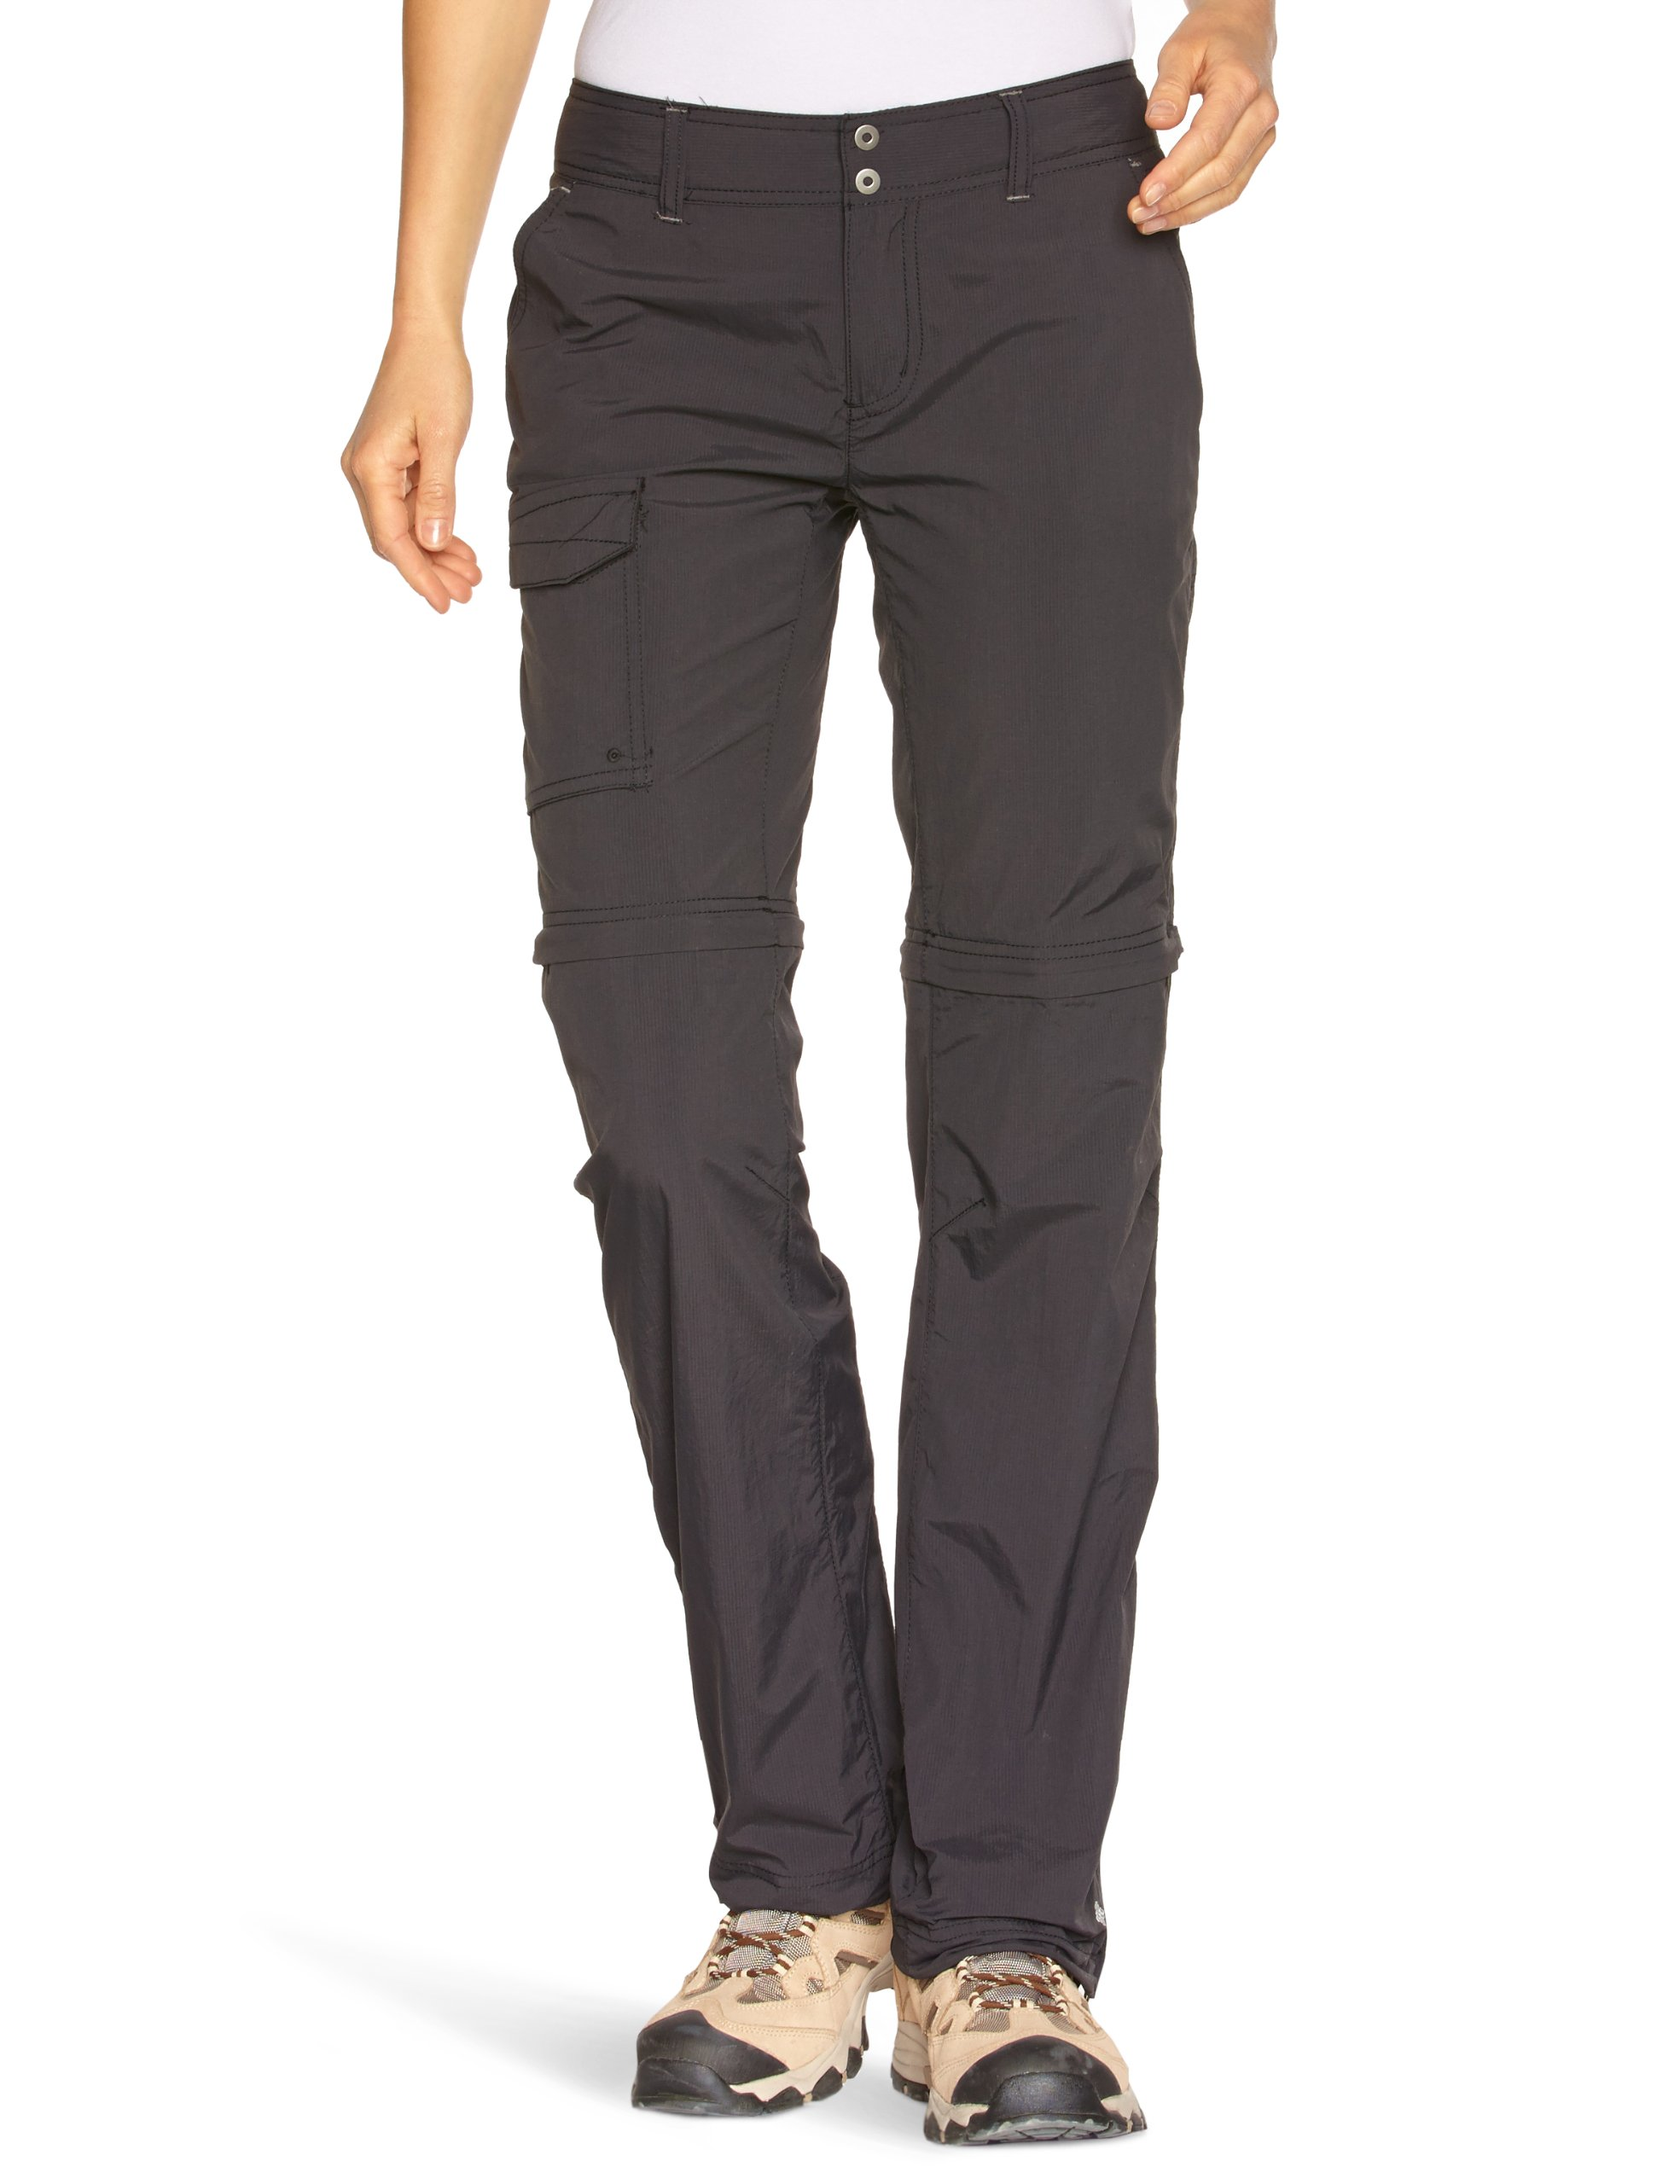 Columbia Women's Silver Ridge Convertible Full Leg Pant, 6, Black,32.0 in long